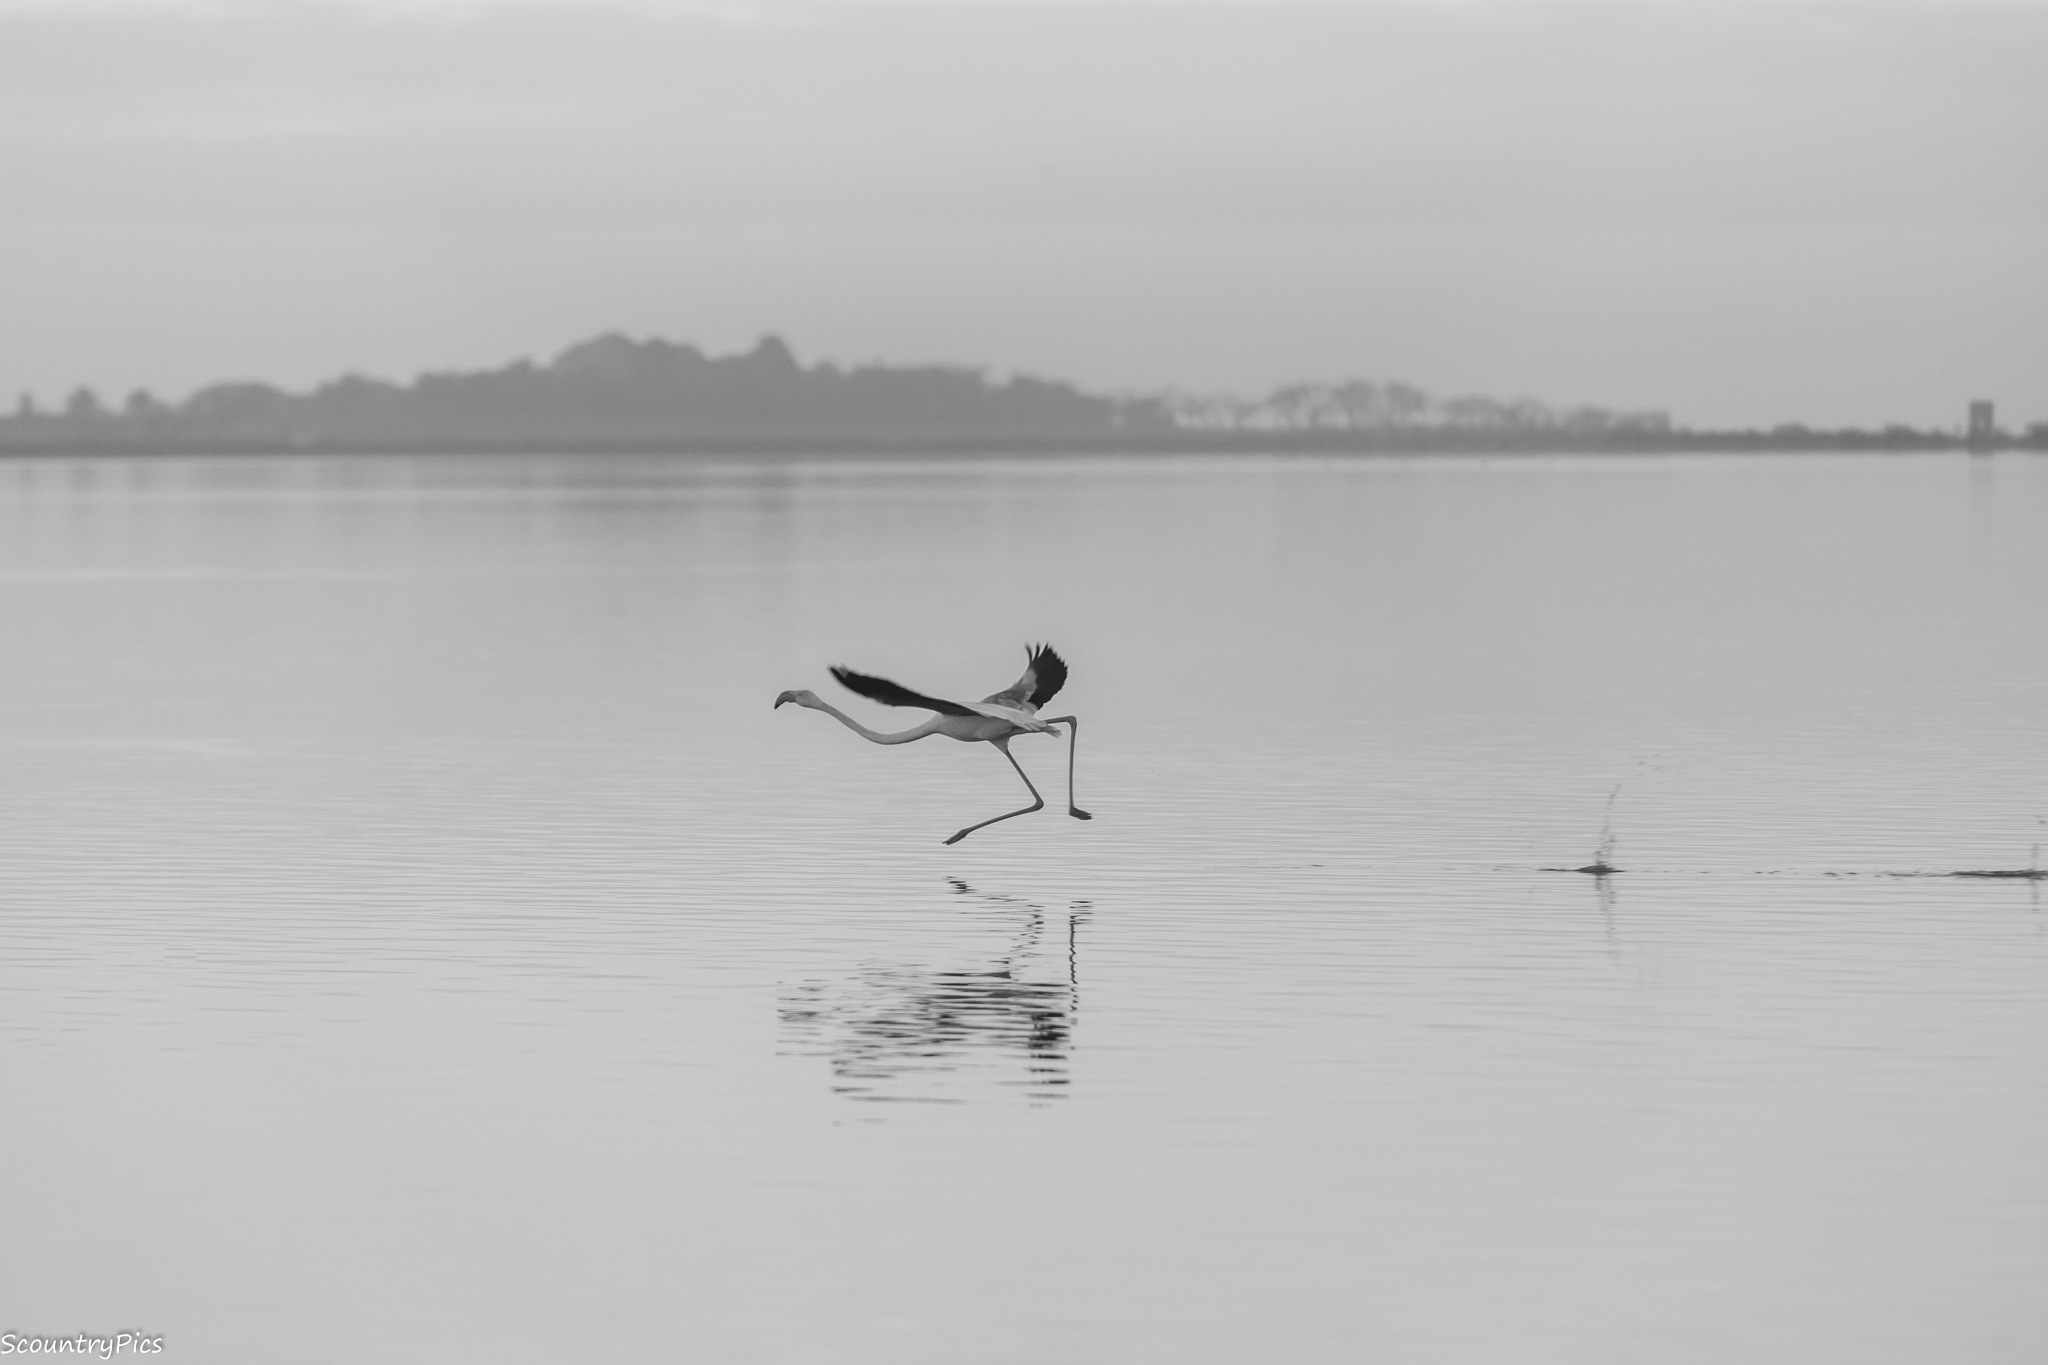 take off by Scountry Salim